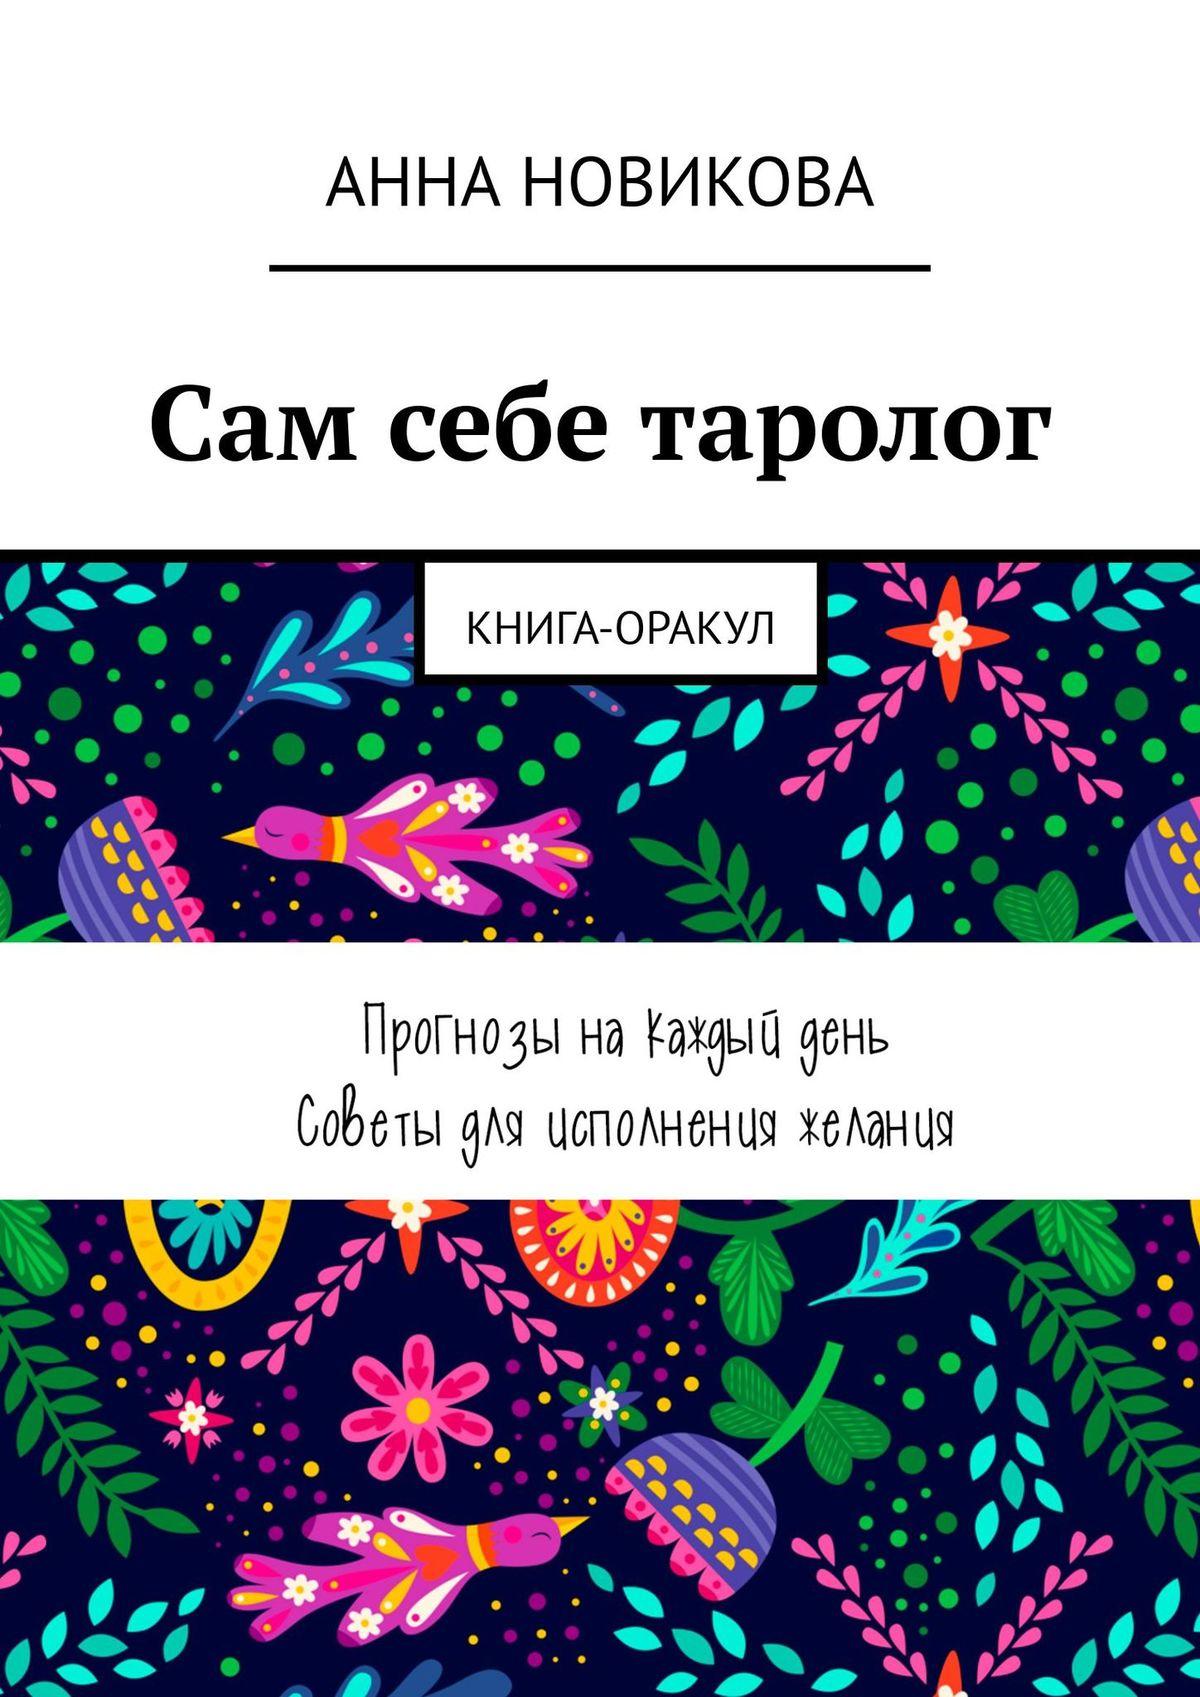 Сам себе таролог. Книга-оракул_Анна Новикова